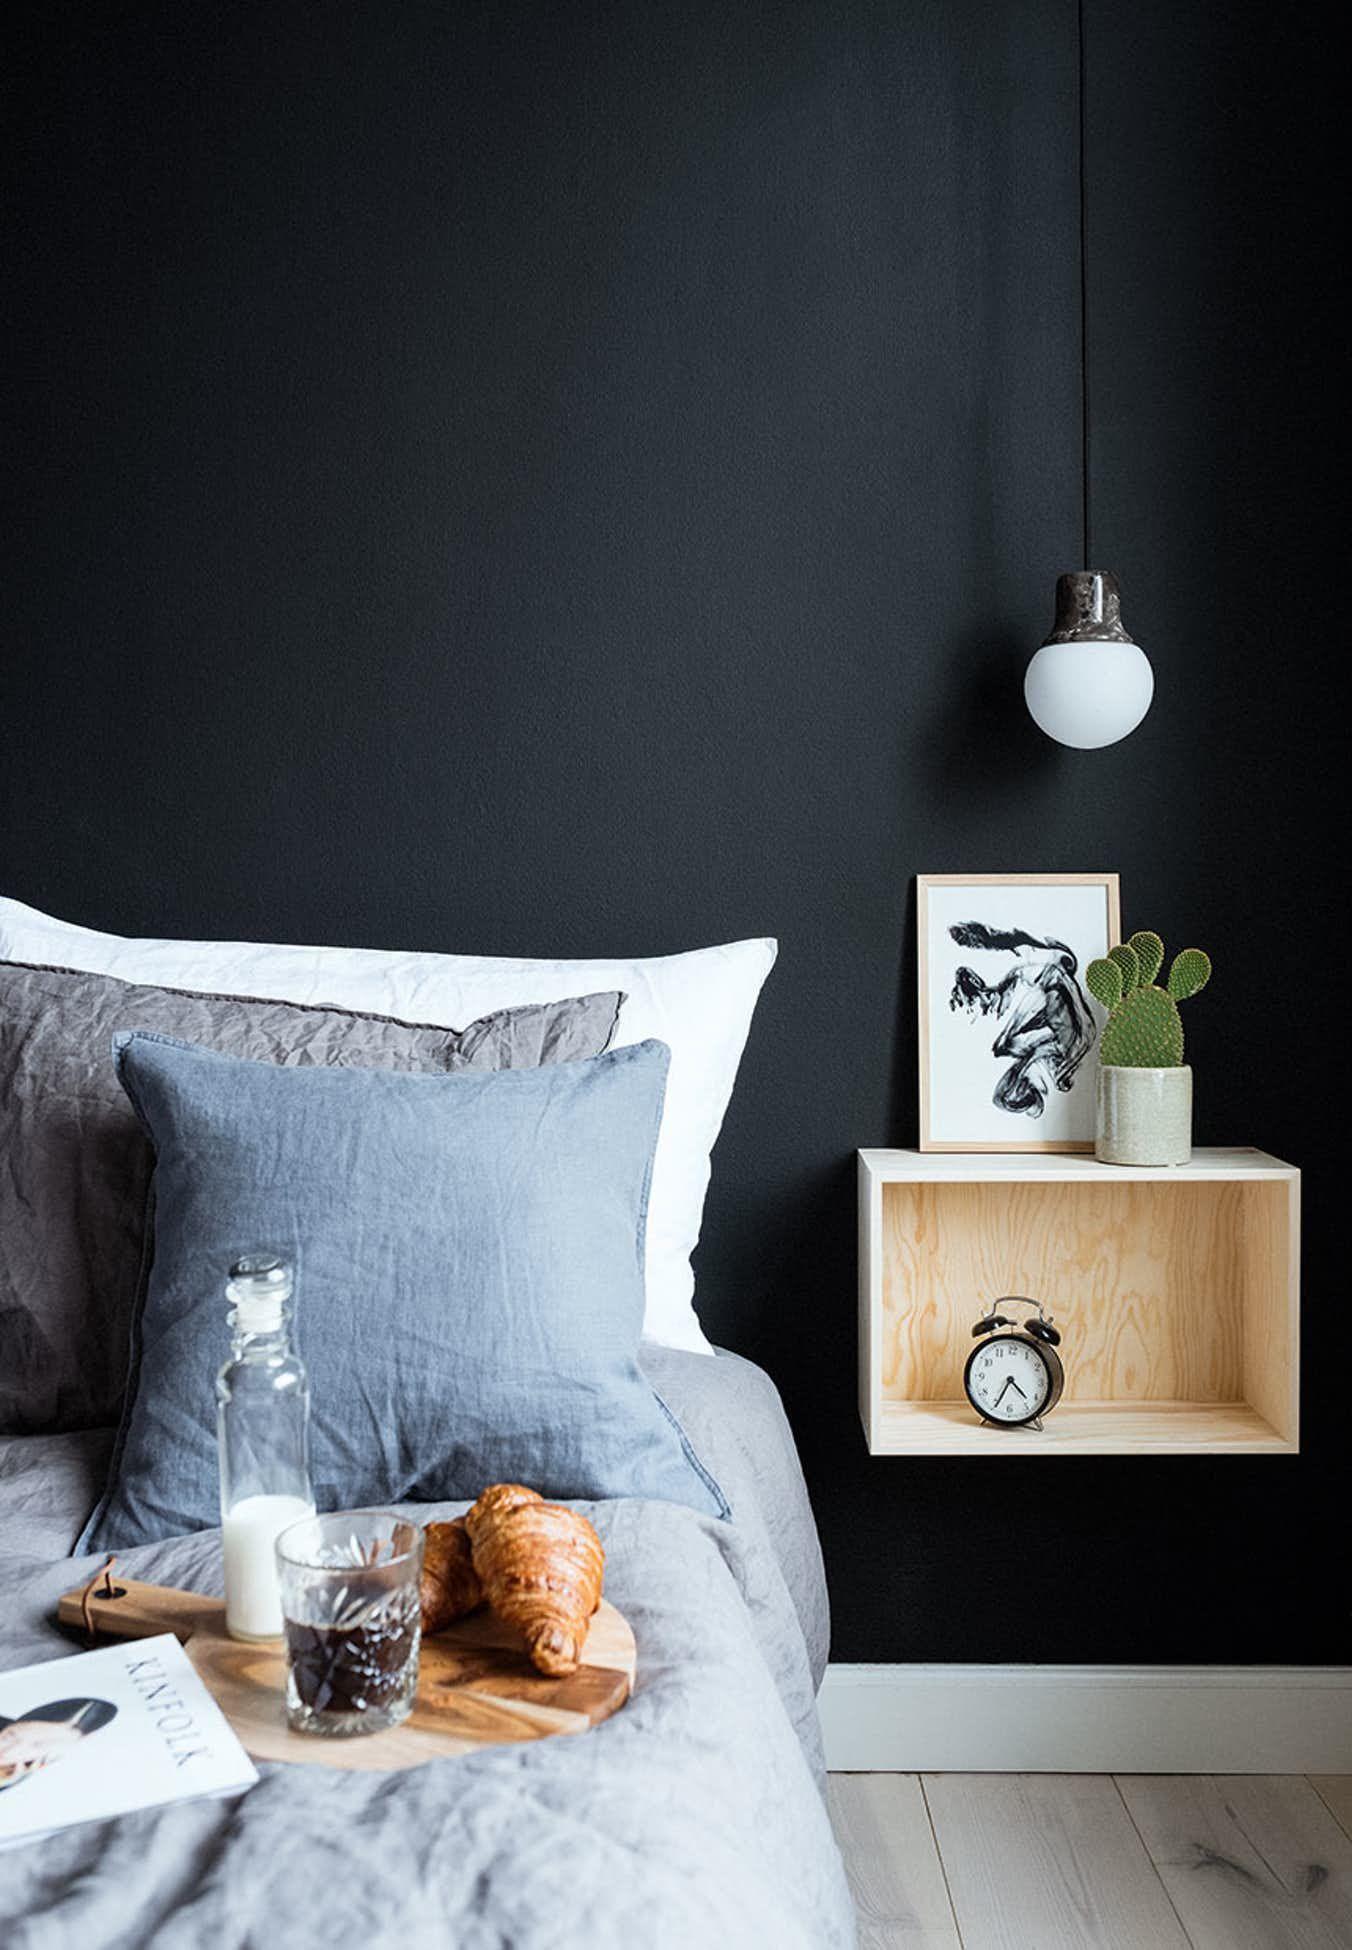 110 kvadratmeter lækker herrehybel   Pinterest   Schlafzimmer ...